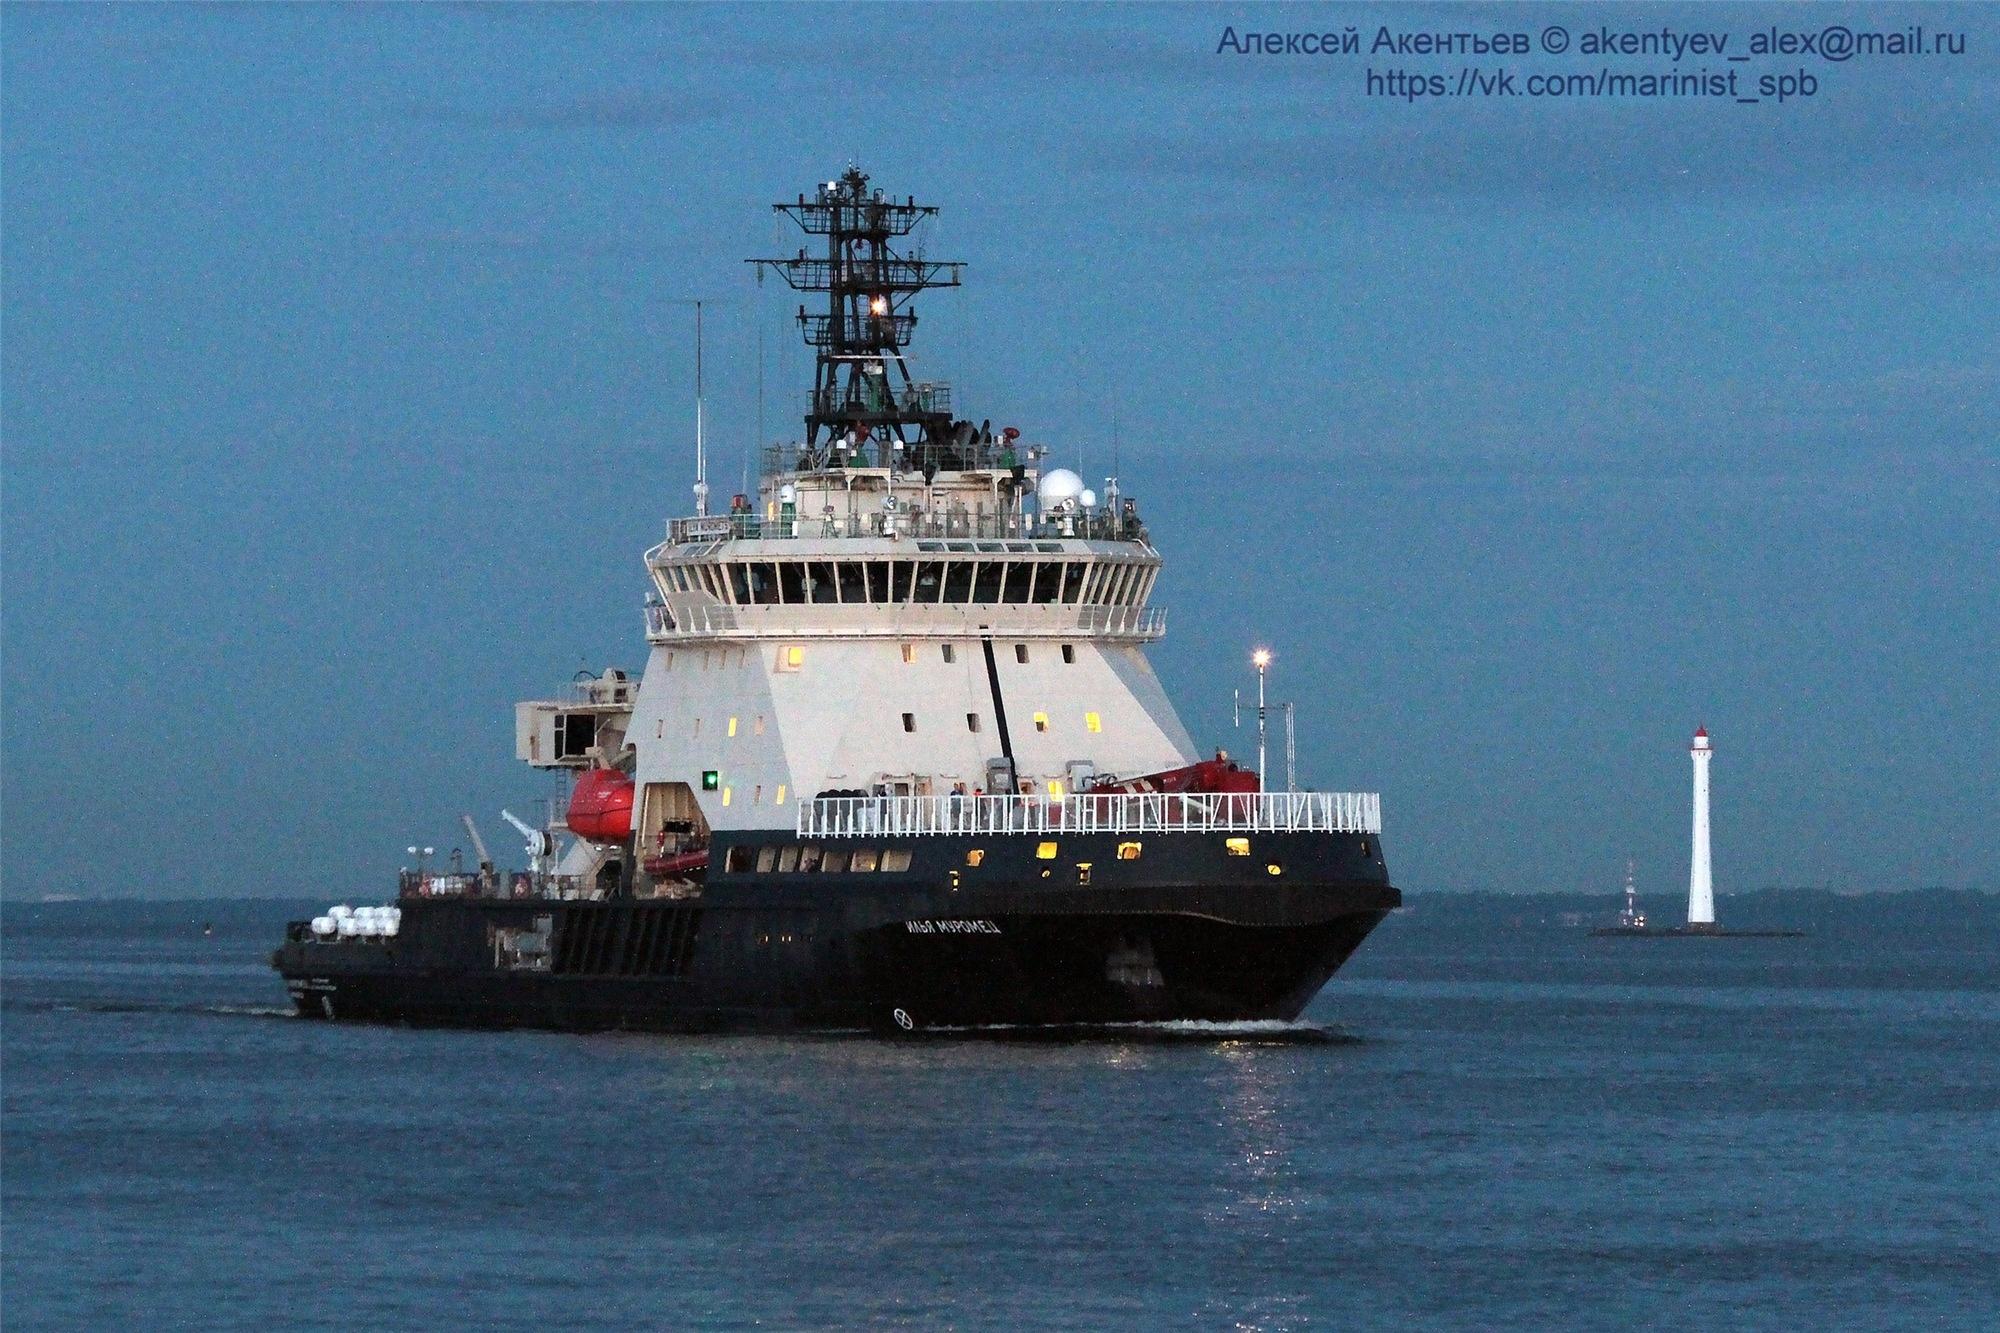 В Петербурге 30 ноября поднимут флаг ВМФ на